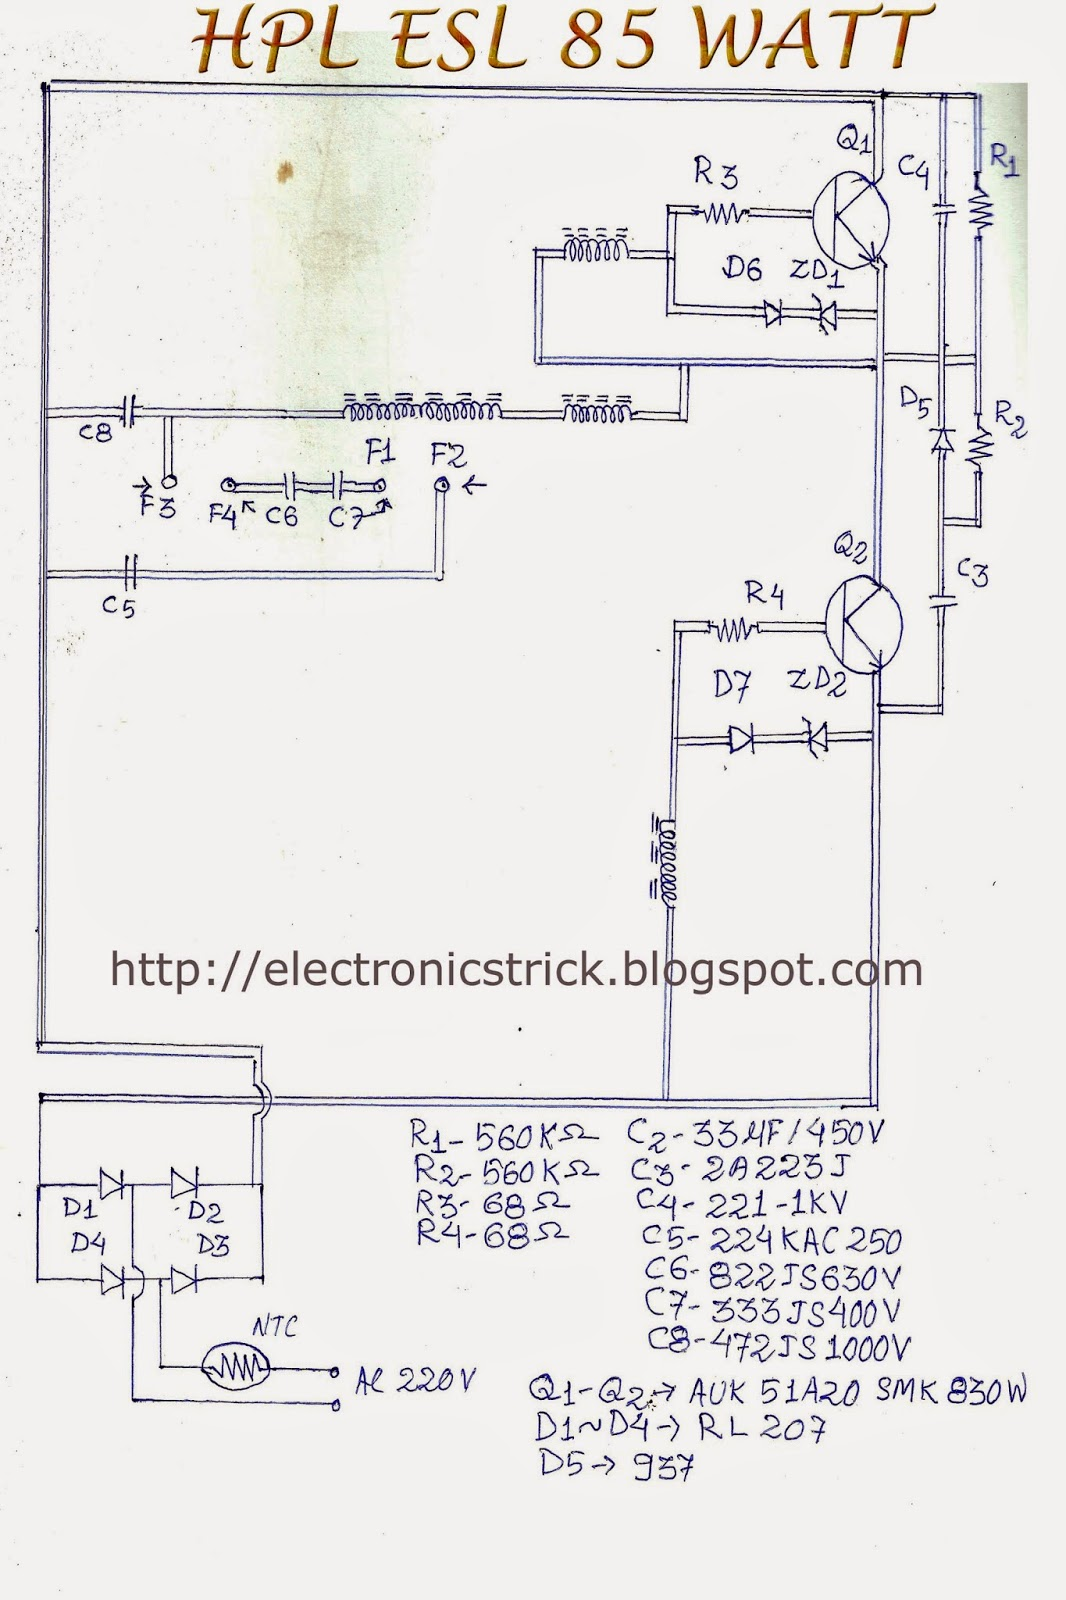 compact fluorescent 4 pin wiring diagram wiring library18 w cfl circuit diagram wiring diagram schematics diagram [ 1066 x 1600 Pixel ]